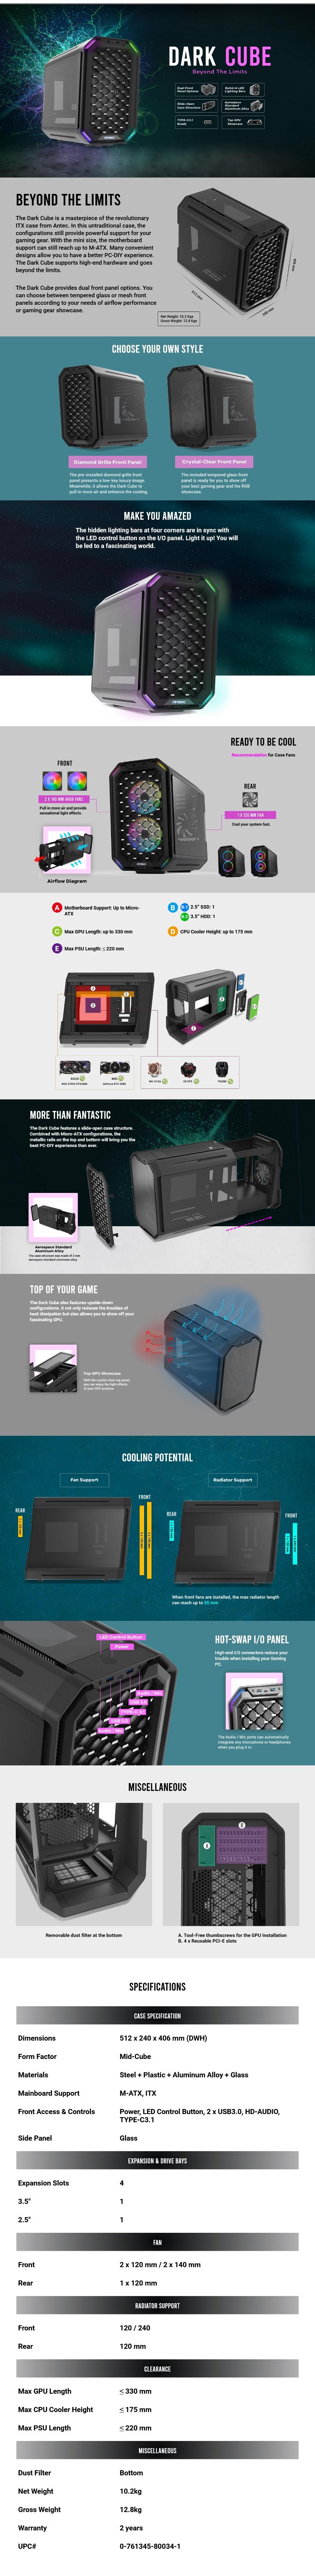 antec-dark-cube-midcube-tempered-glass-microatx-case-ac43328-9.jpg